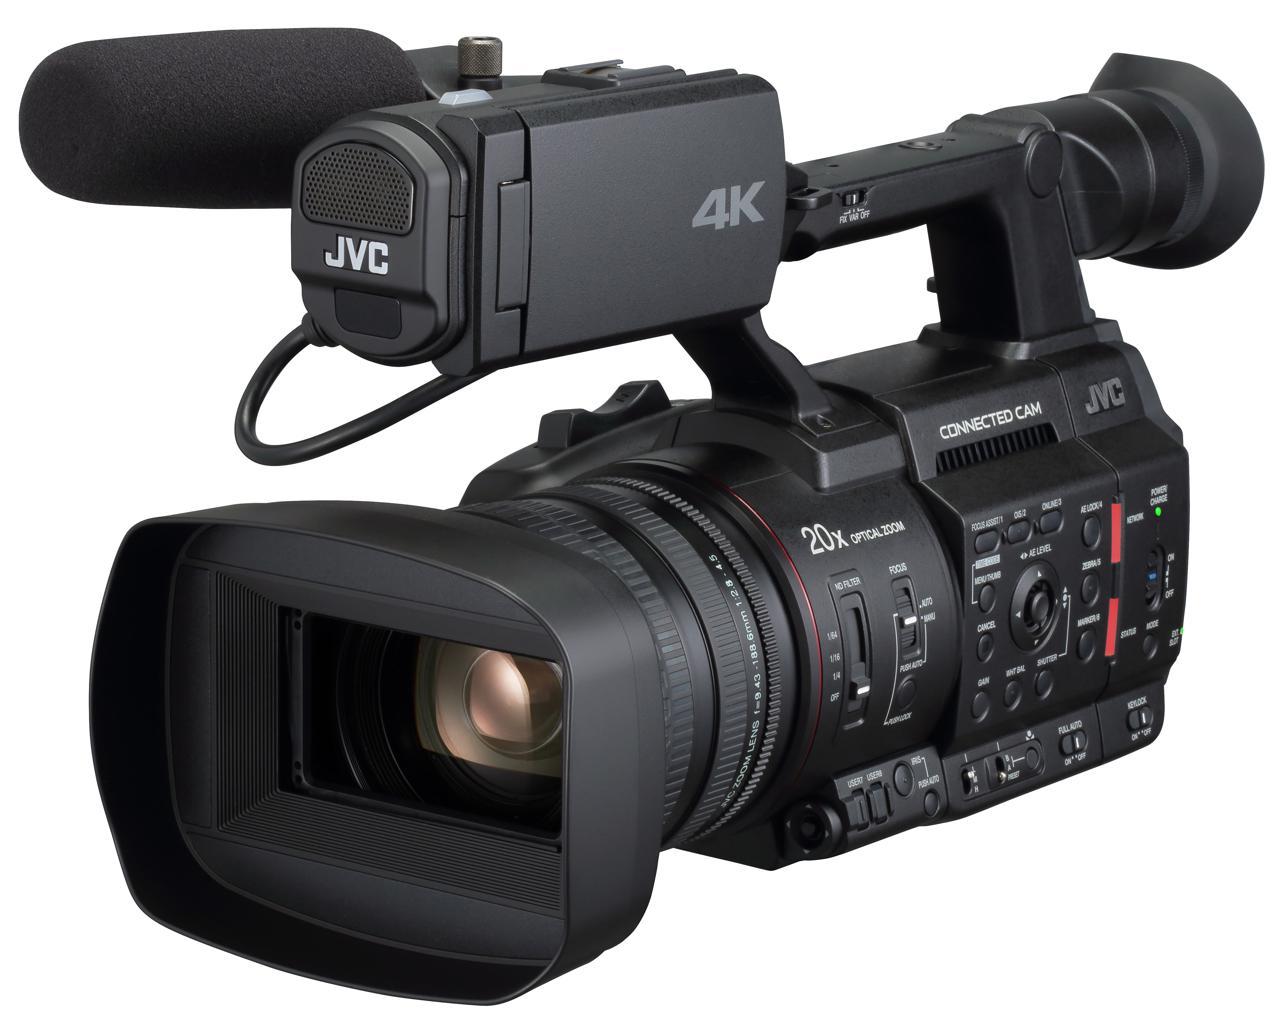 jvcgy-hc500